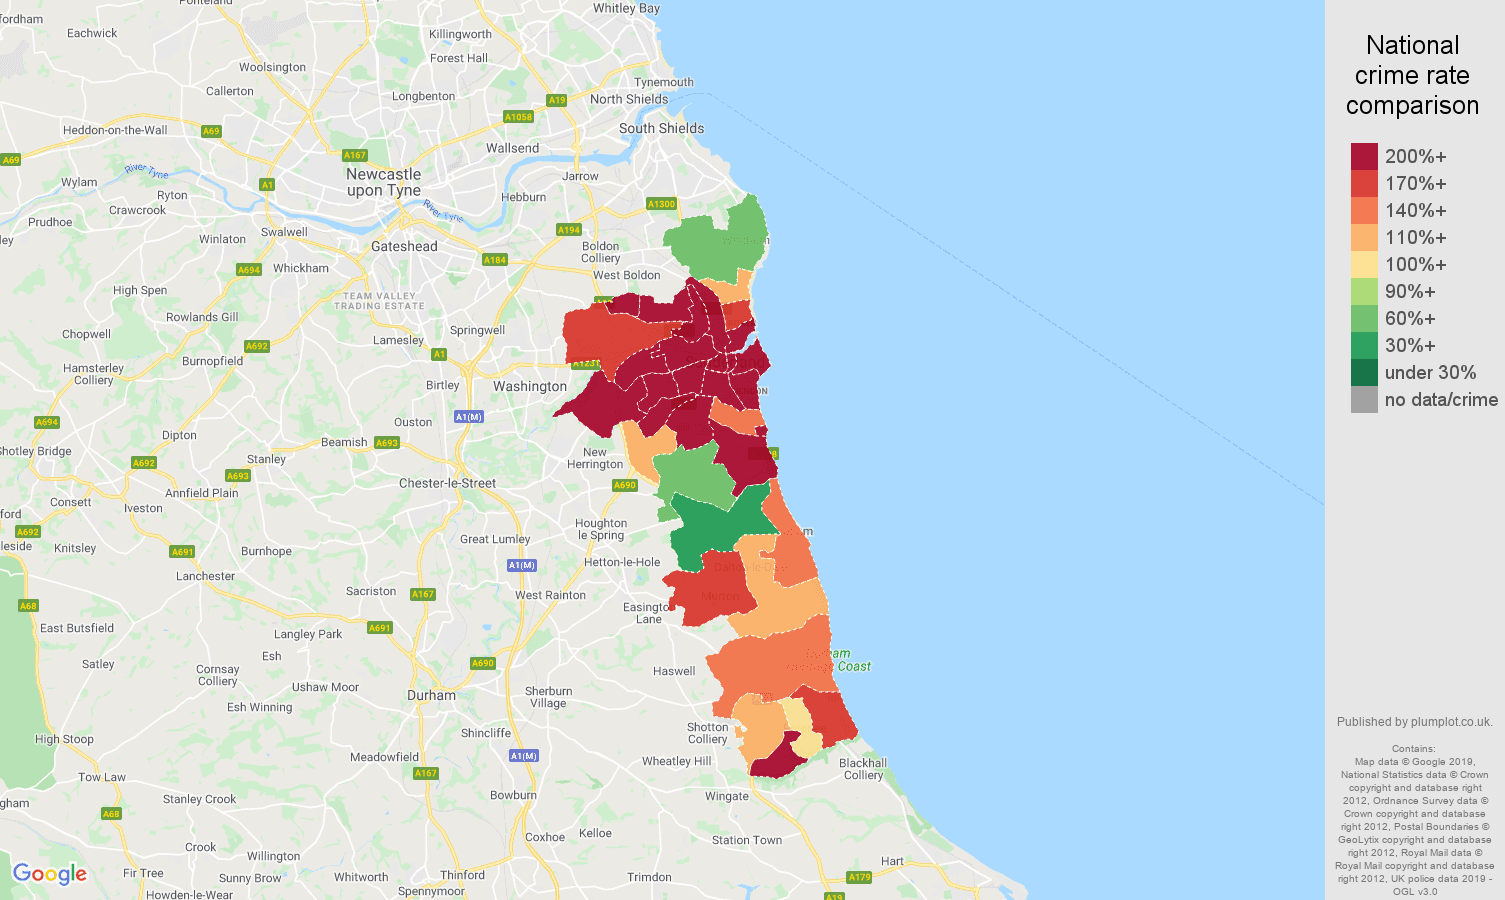 Sunderland public order crime rate comparison map